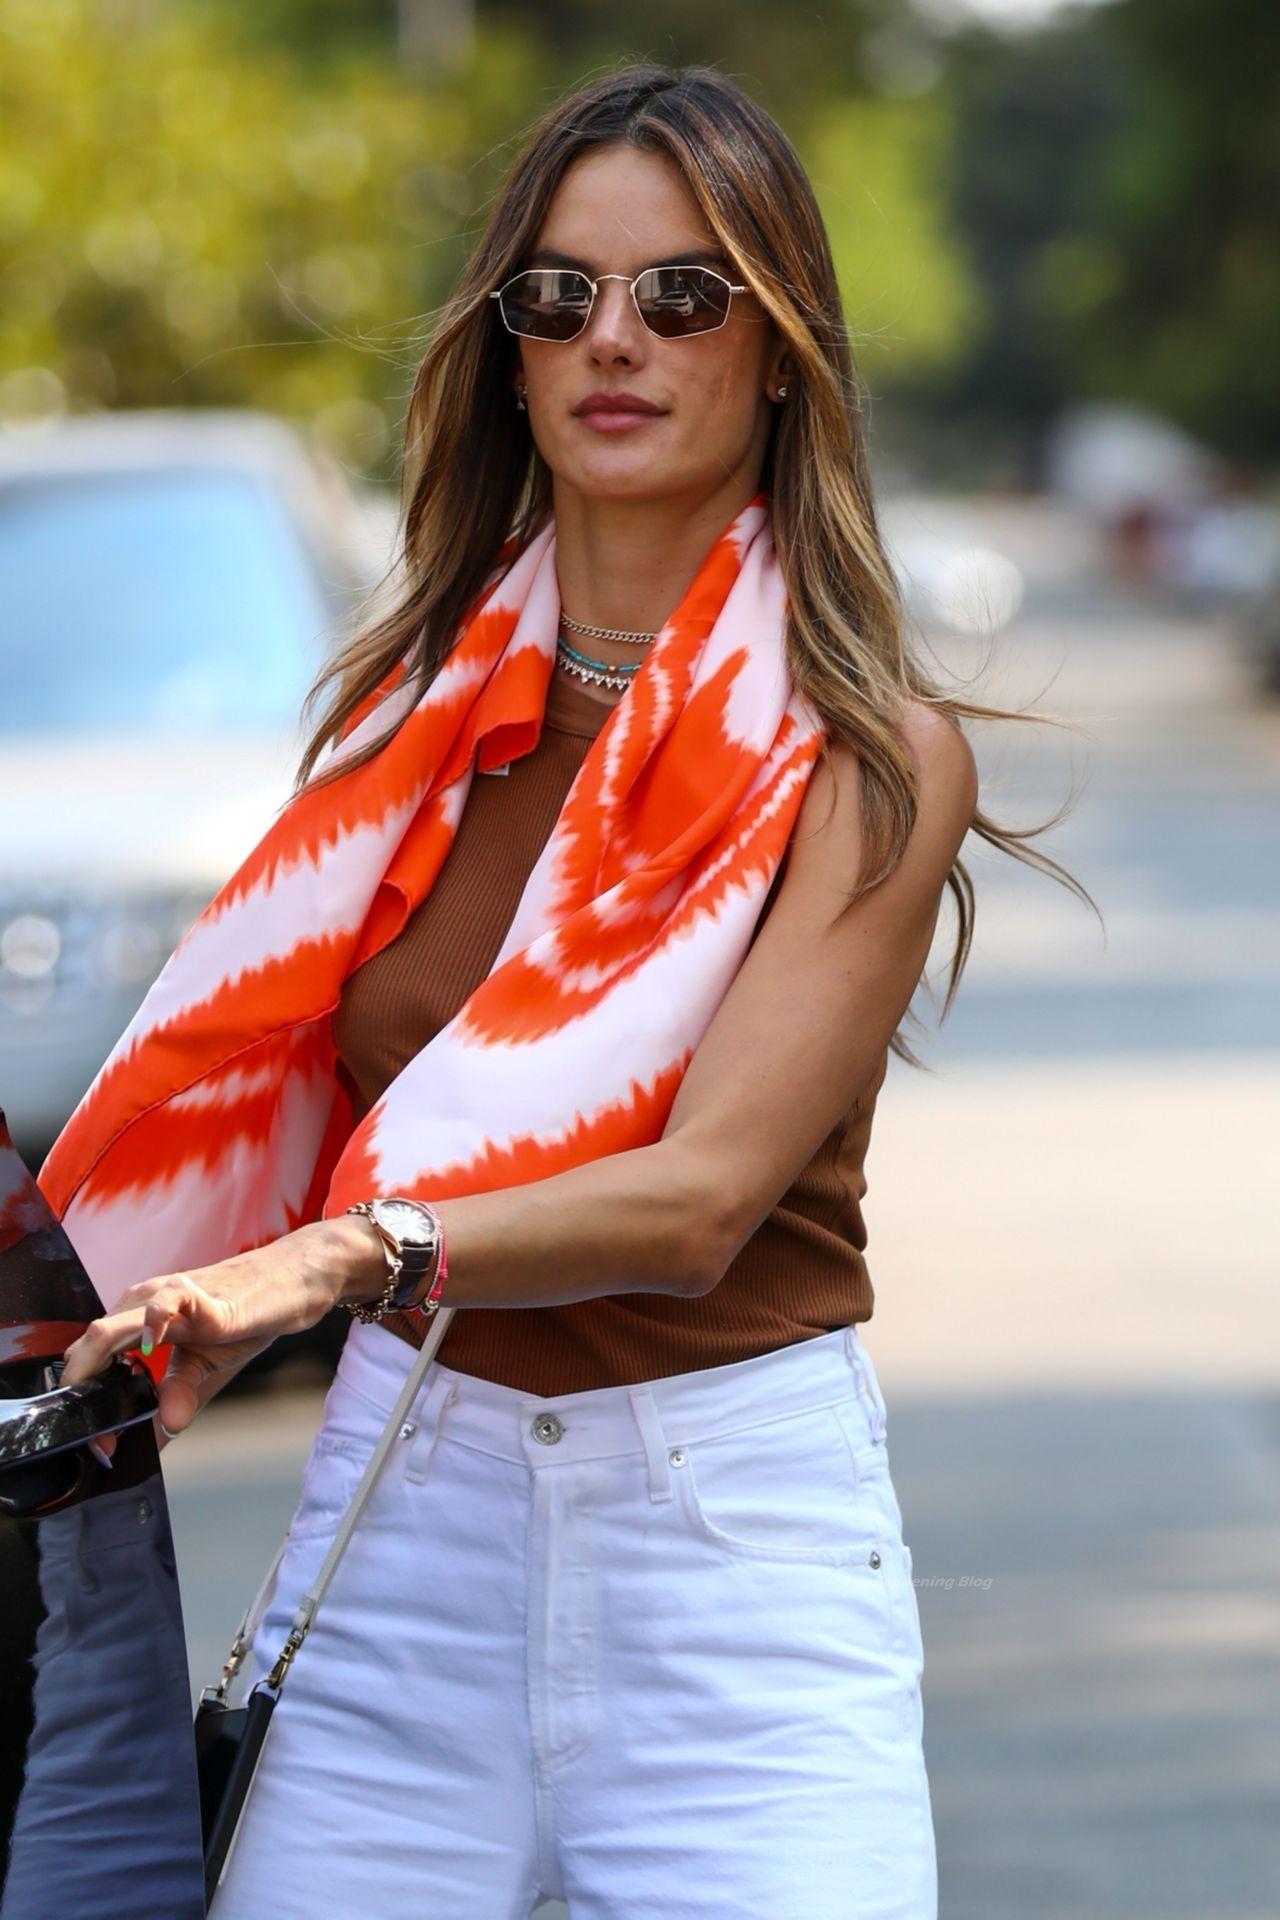 Alessandra-Ambrosio-Braless-The-Fappening-Blog-38.jpg